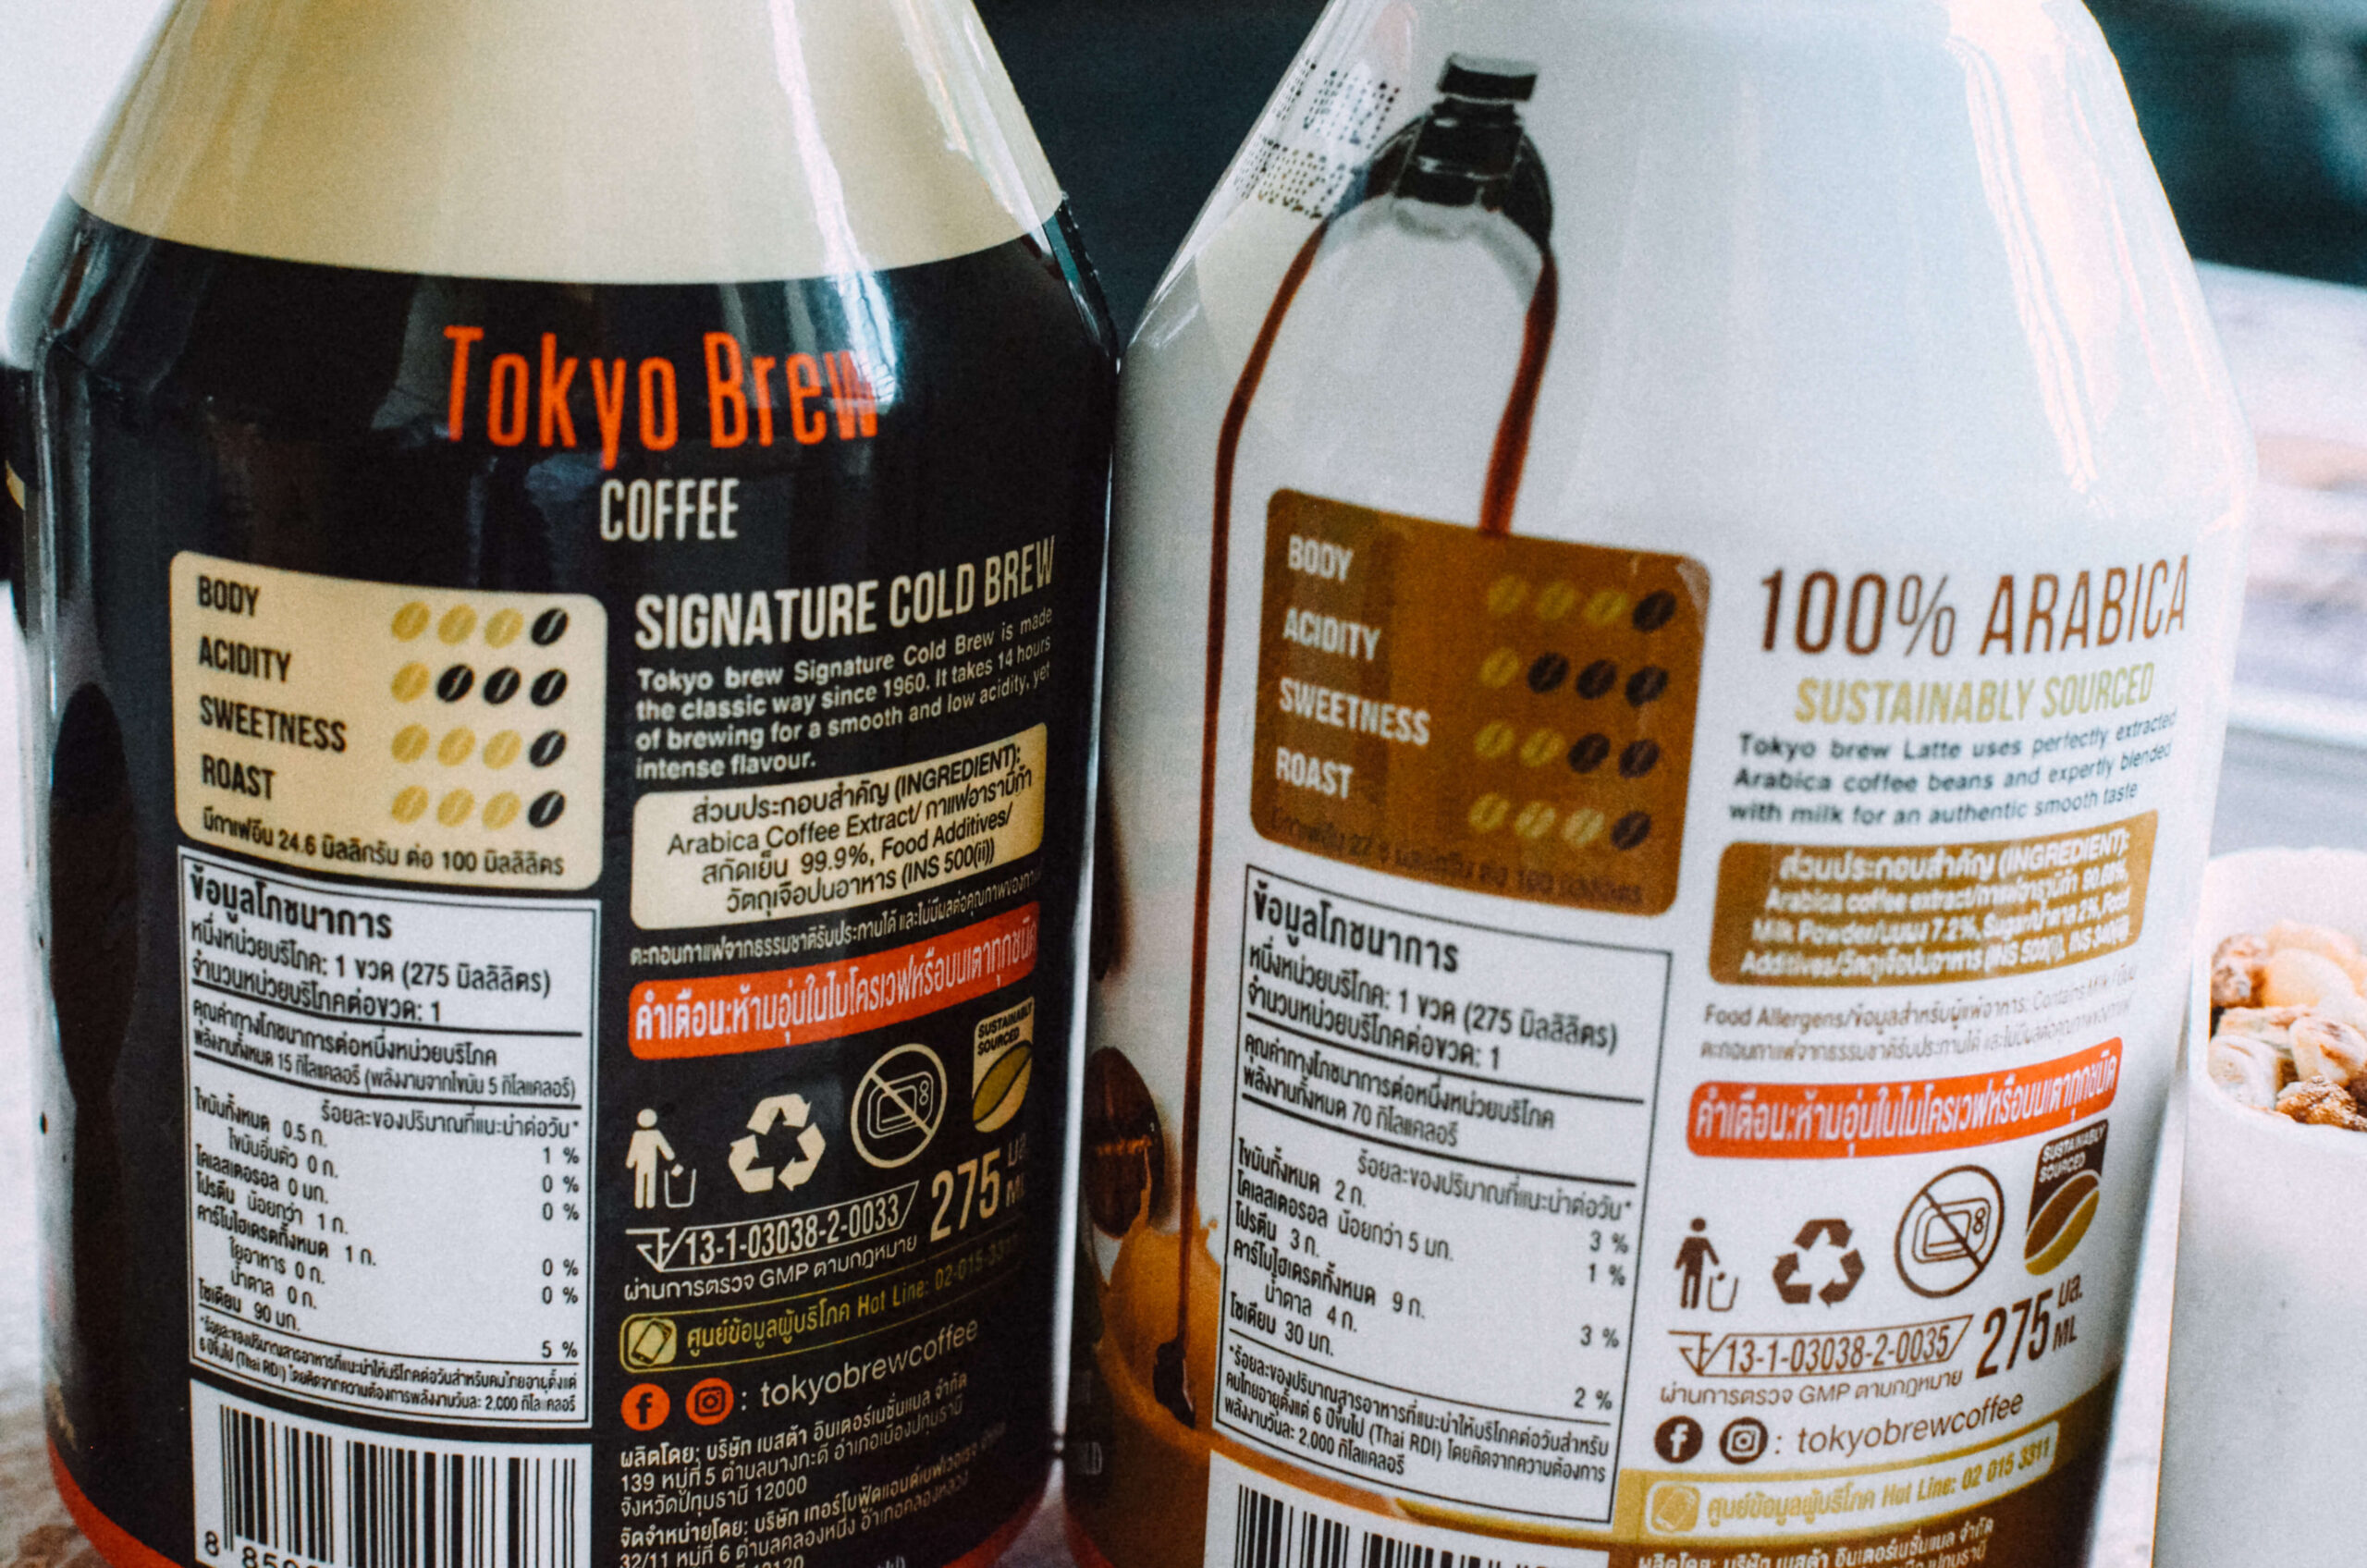 tokyo brew coffee back